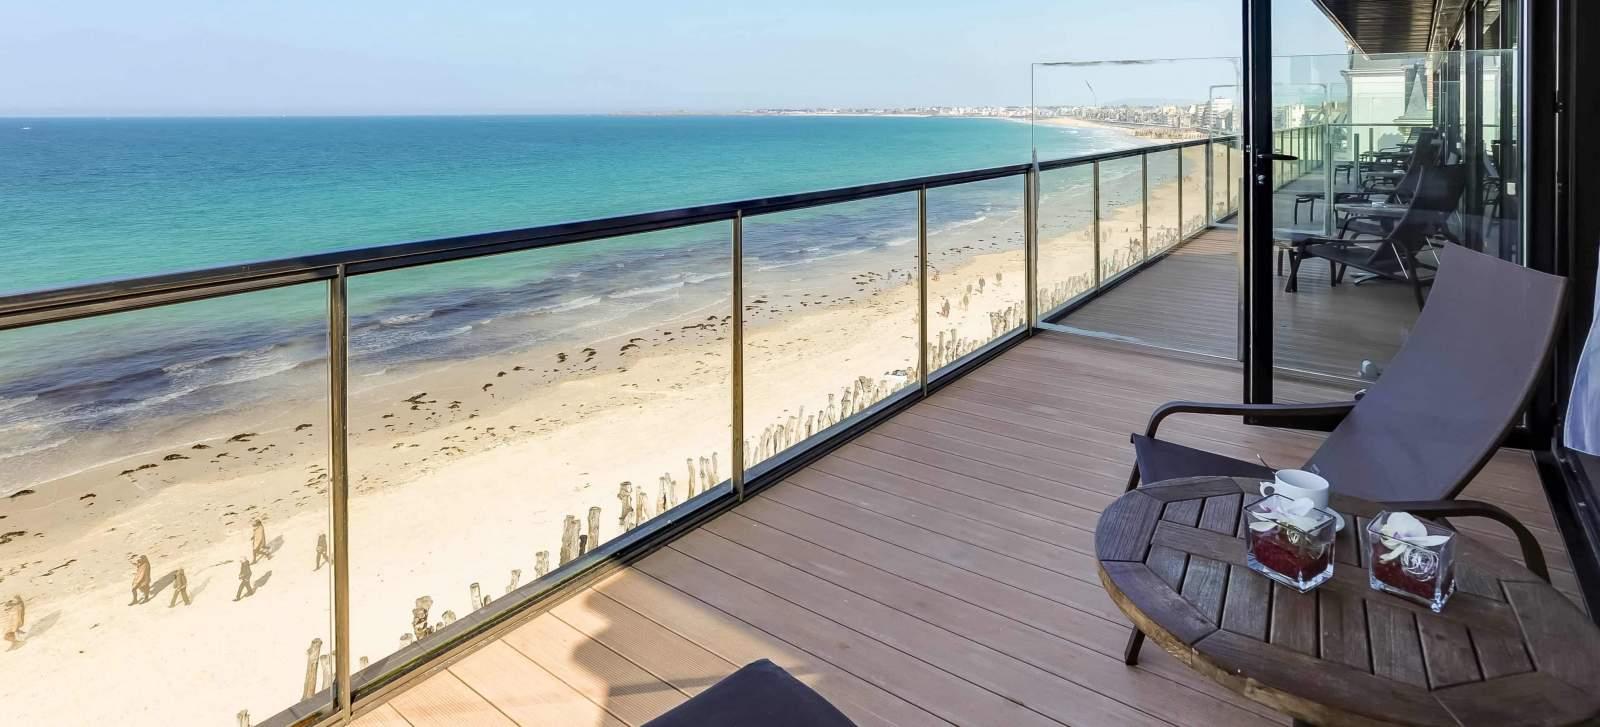 Terrasse chambre vue mer - Hôtel Oceania Saint-Malo 4 étoiles (10).jpg